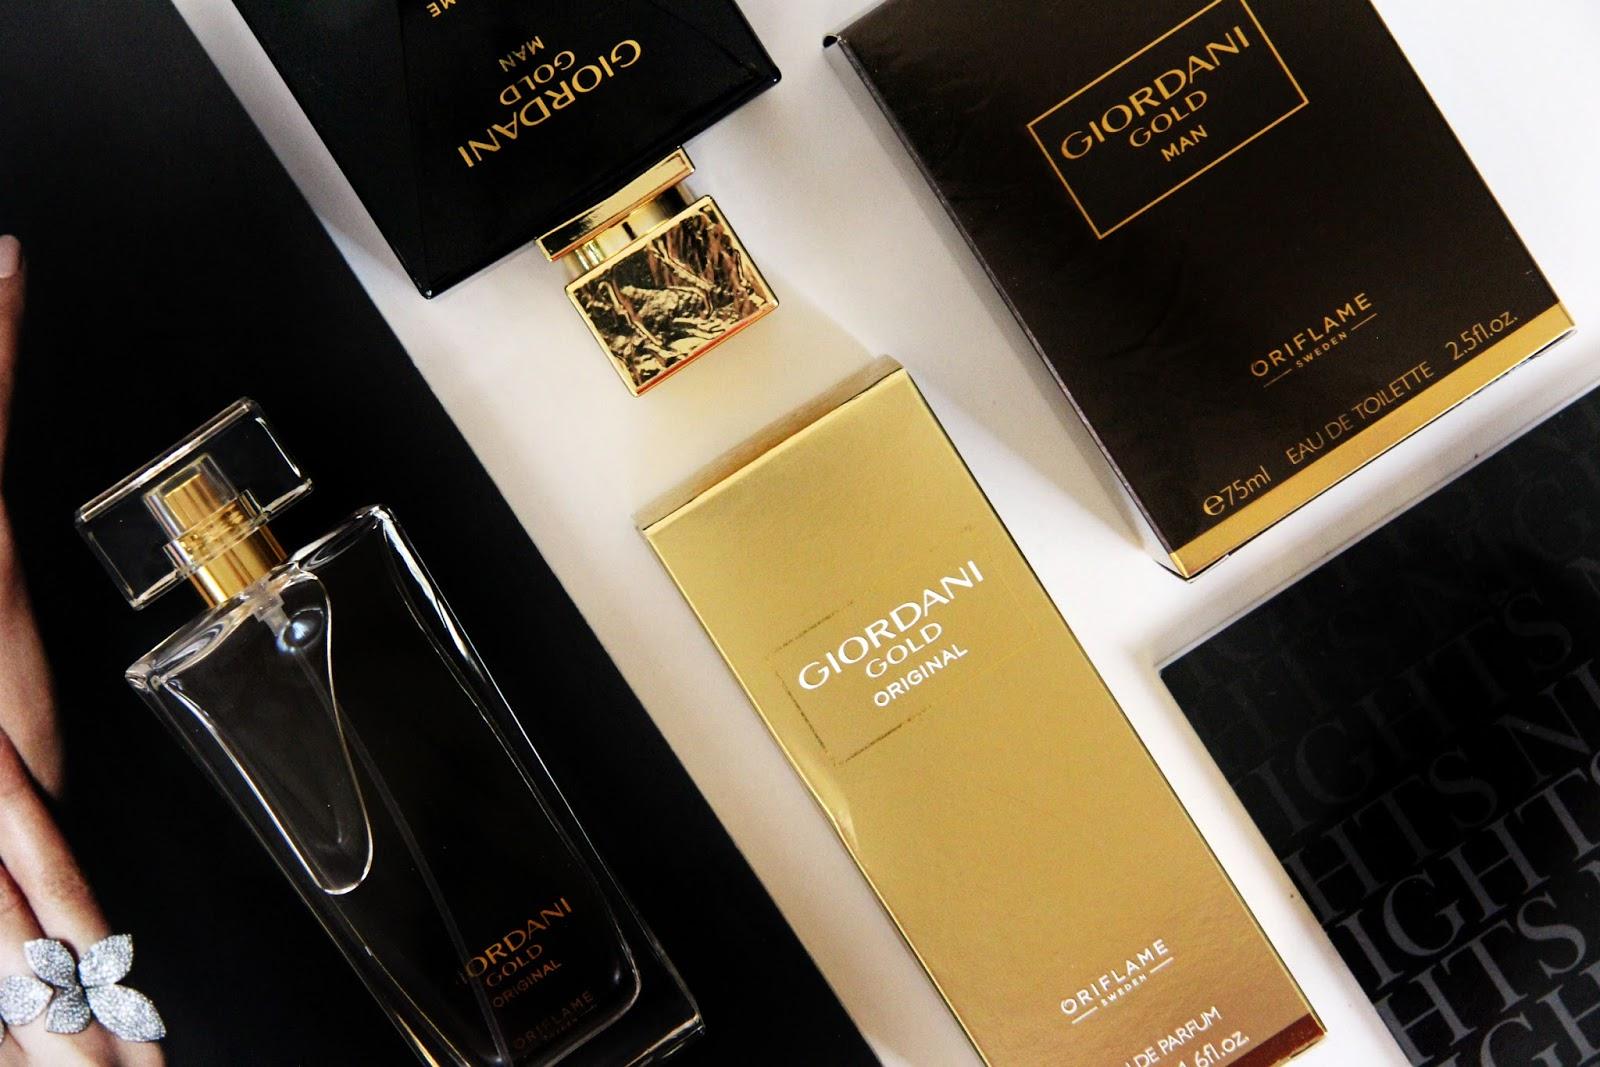 парфюмерный дуэт от Oriflame Giordani Gold Man и Giordani Gold